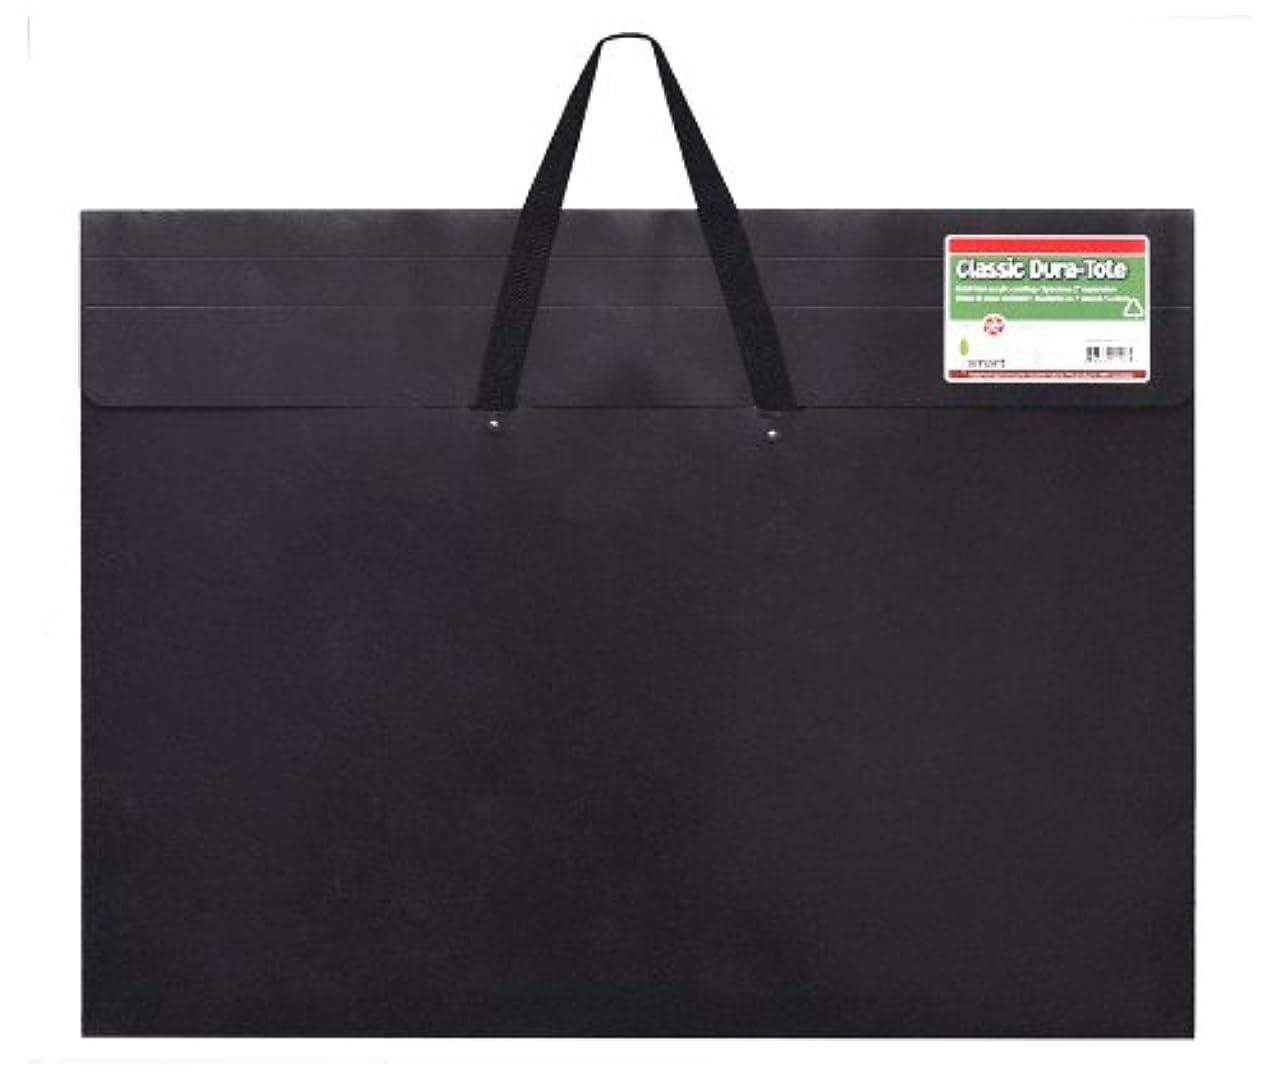 Star Products V409H-Blk Classic Dura-Tote Artist Portfolio, 10 by 15-Inch, Black